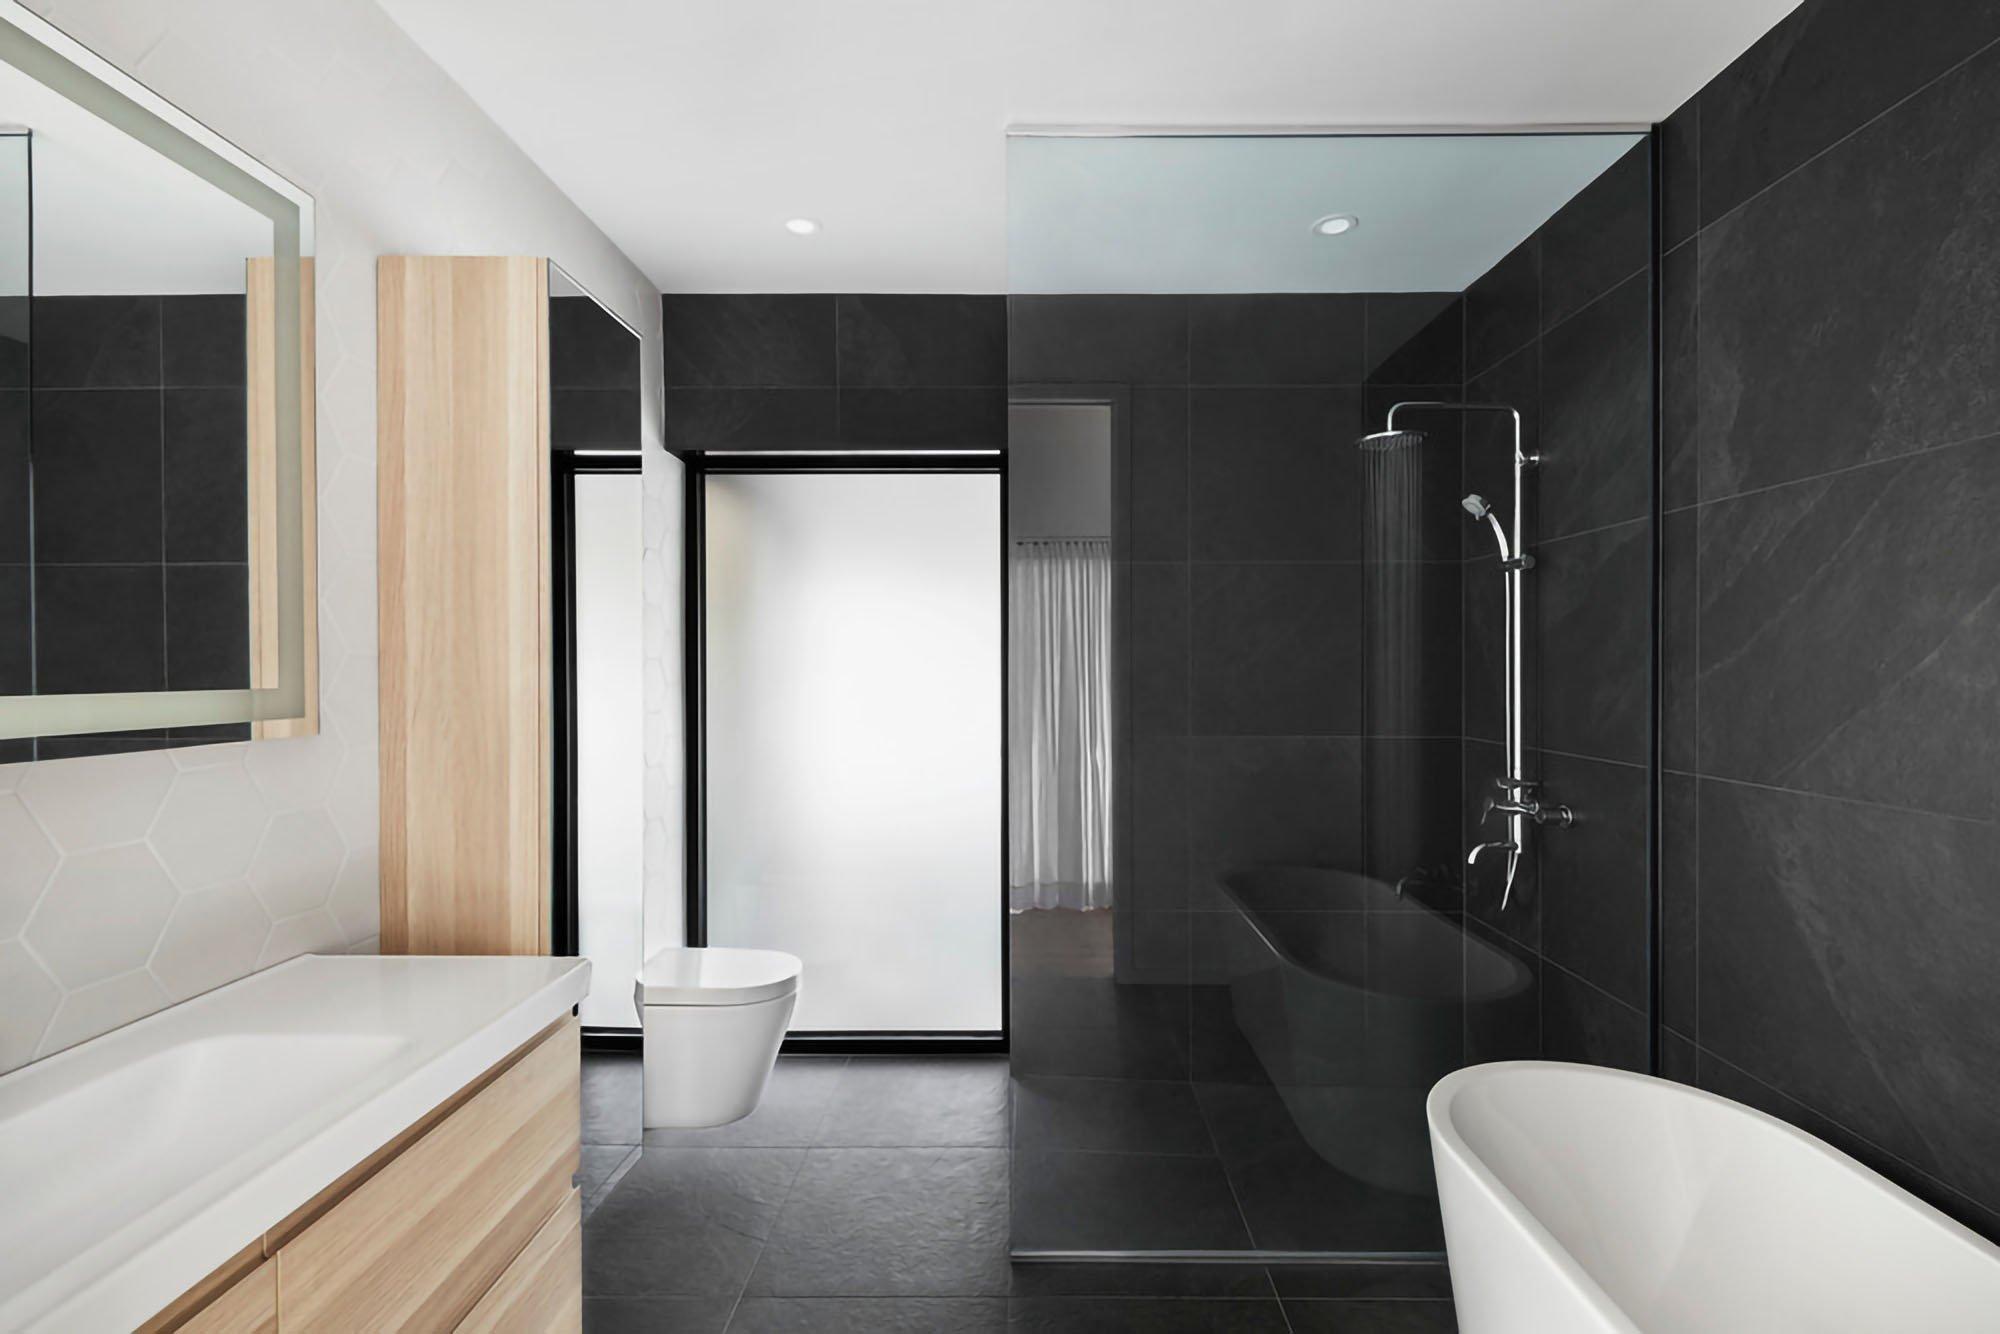 MXMA Architecture & Design